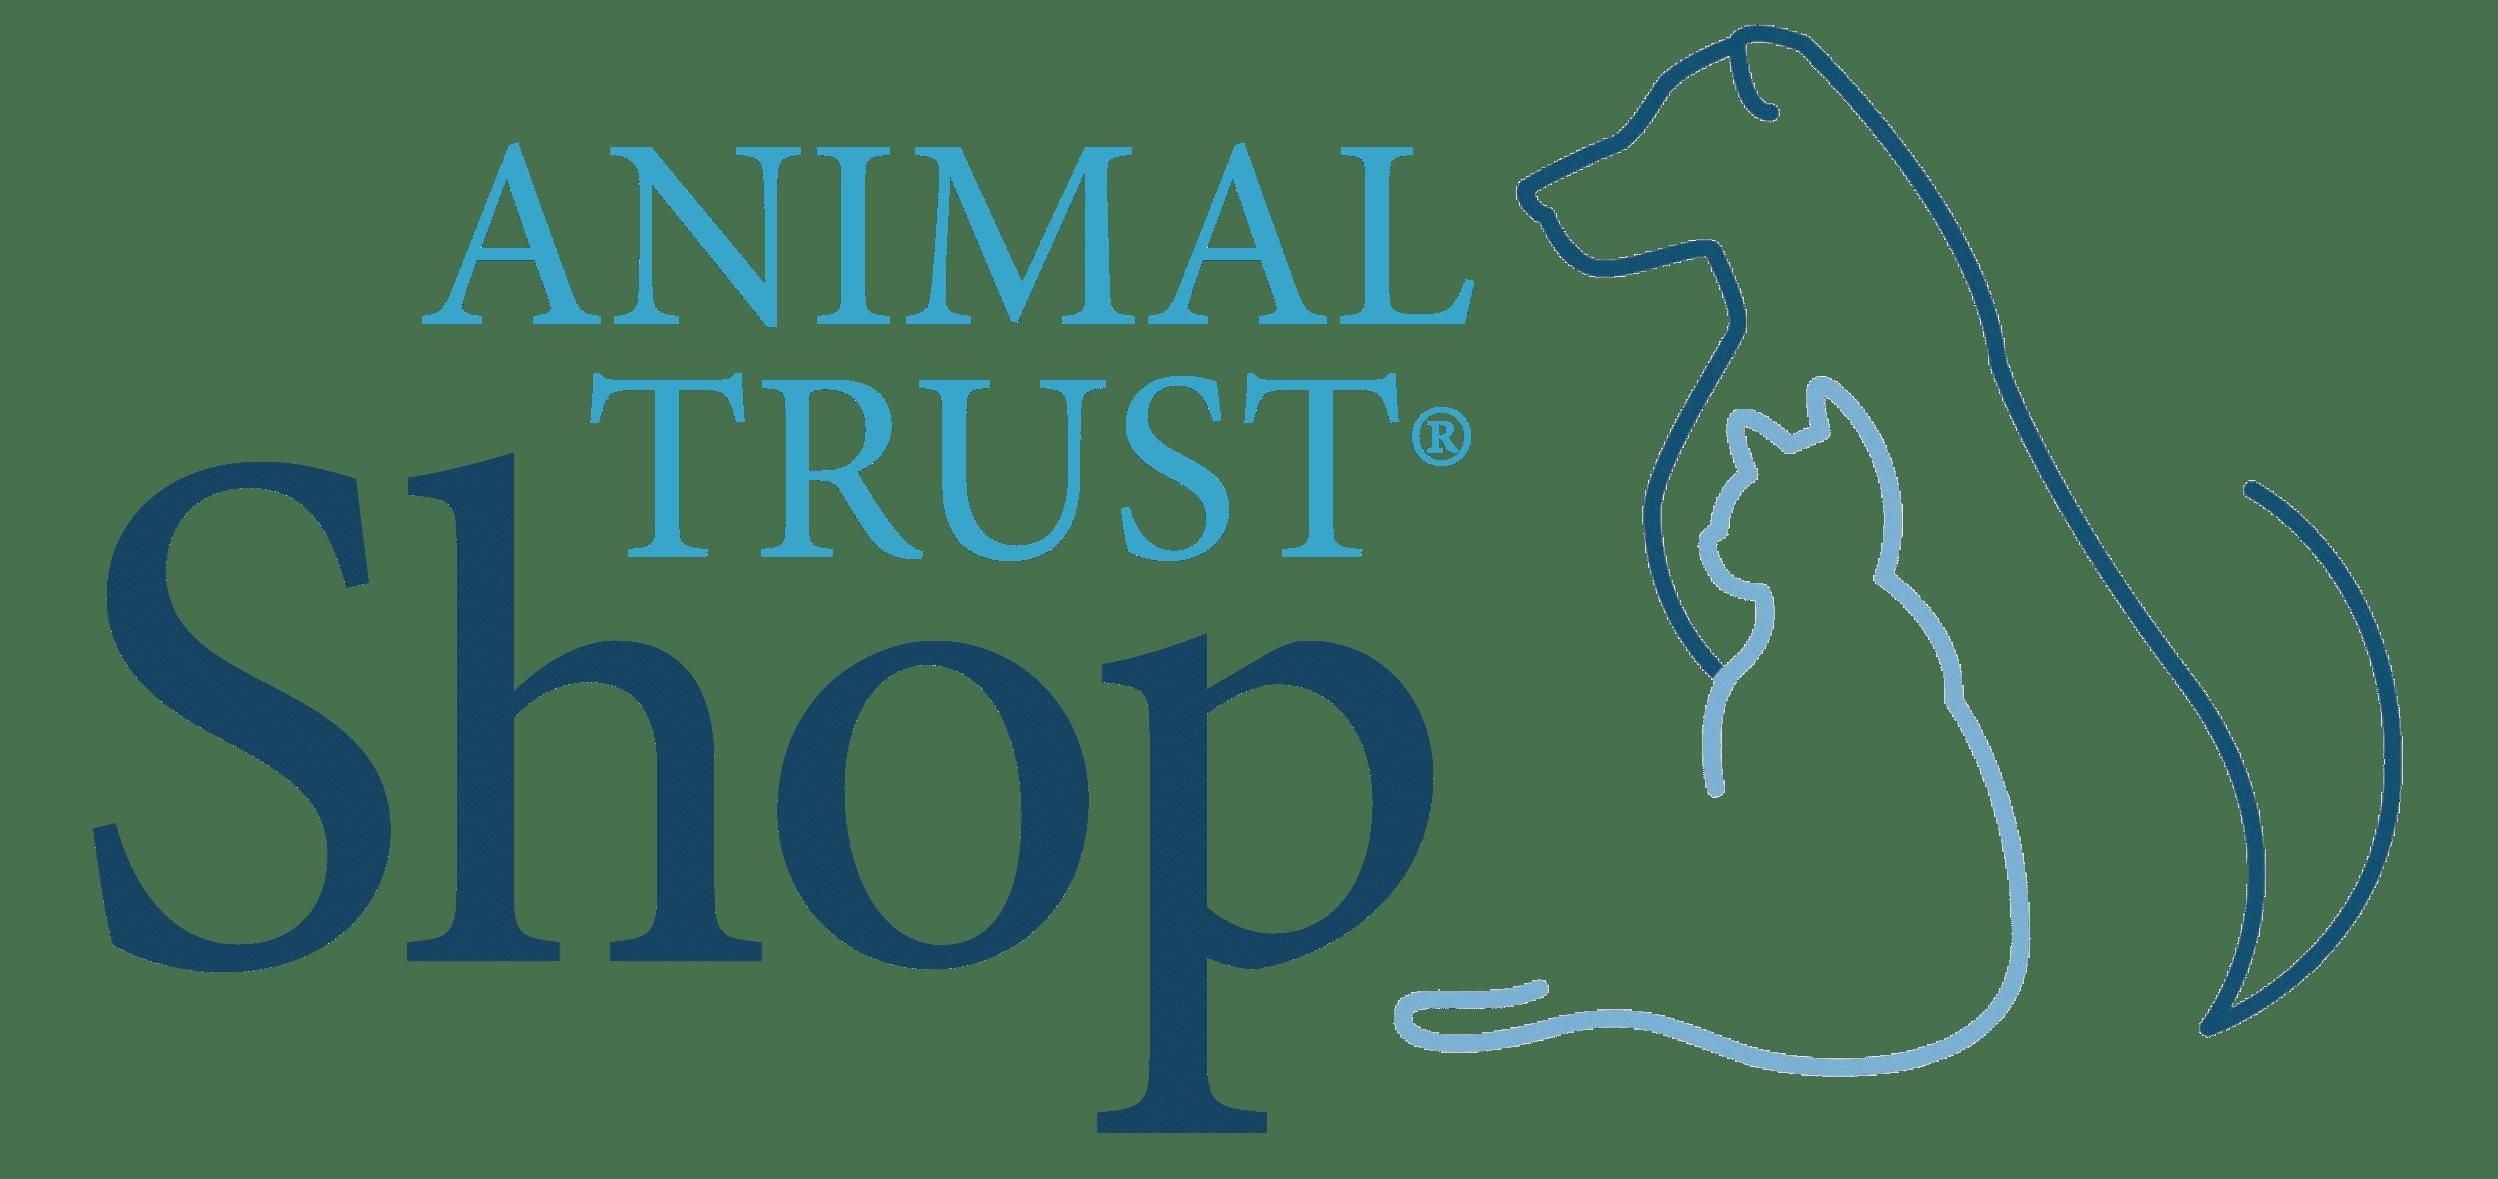 Animal Trust Shop